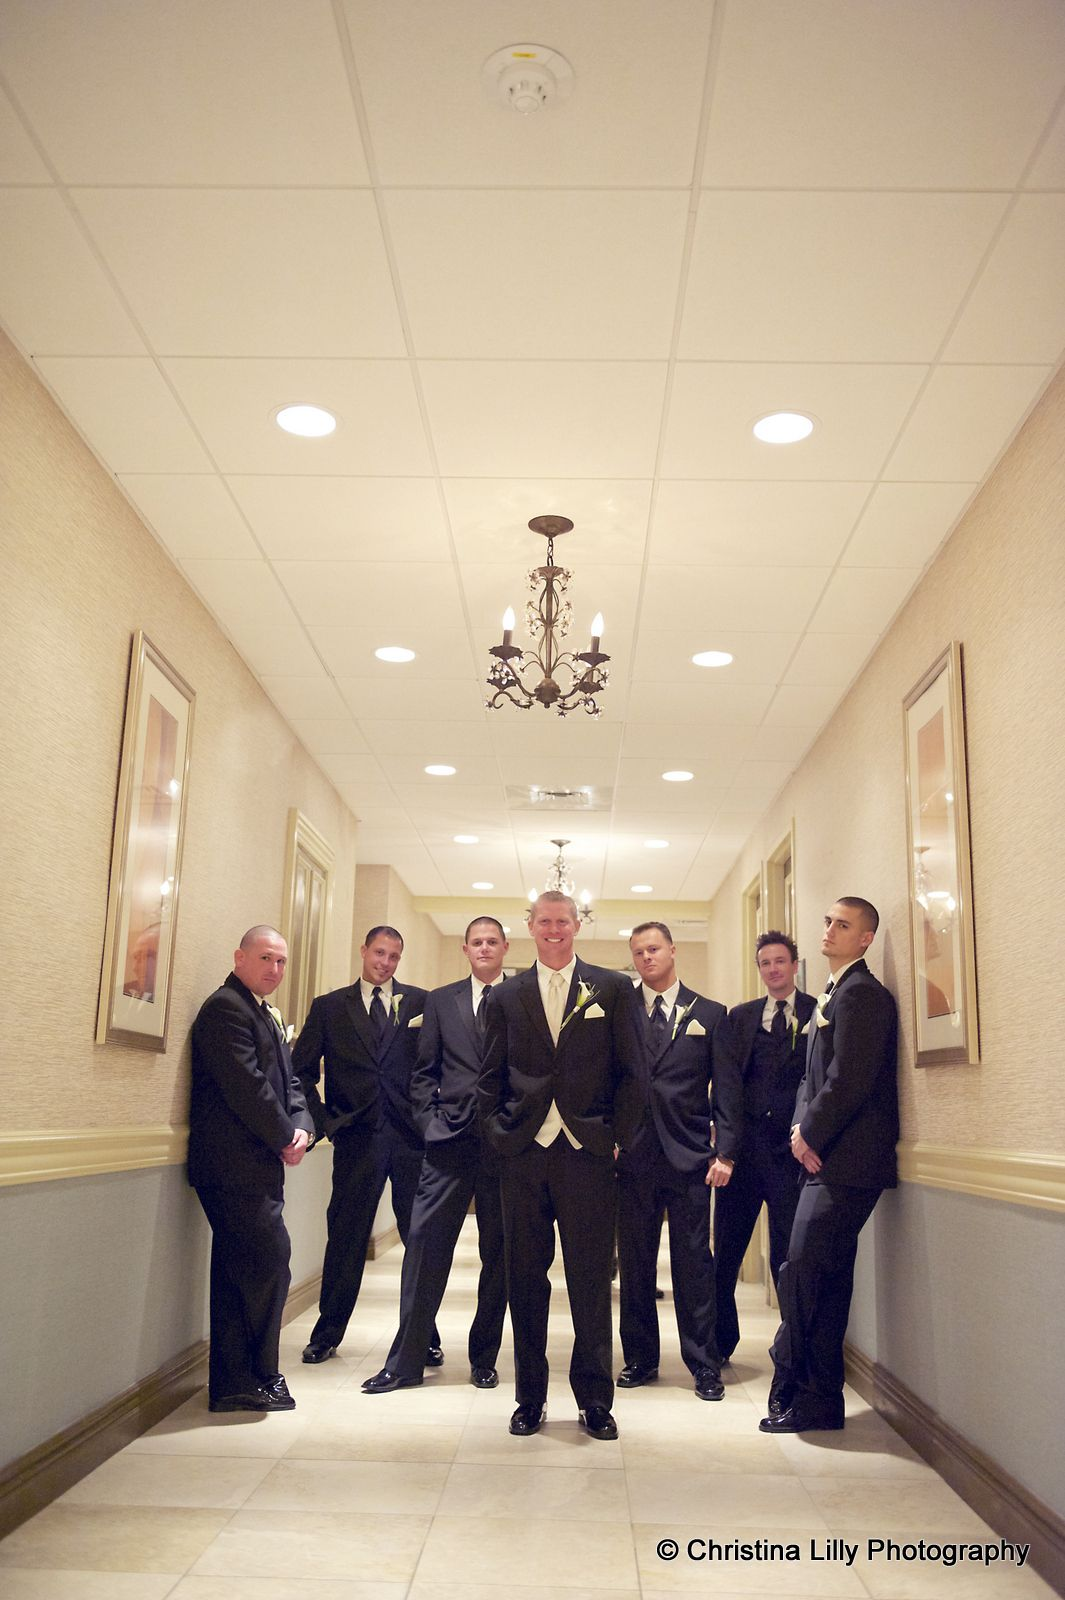 The Groom And His Groomsmen Pose For A Wedding Photo Www Crystalballroomnj Com Photo Cour Wedding Group Photos Creative Wedding Photography Wedding Photos